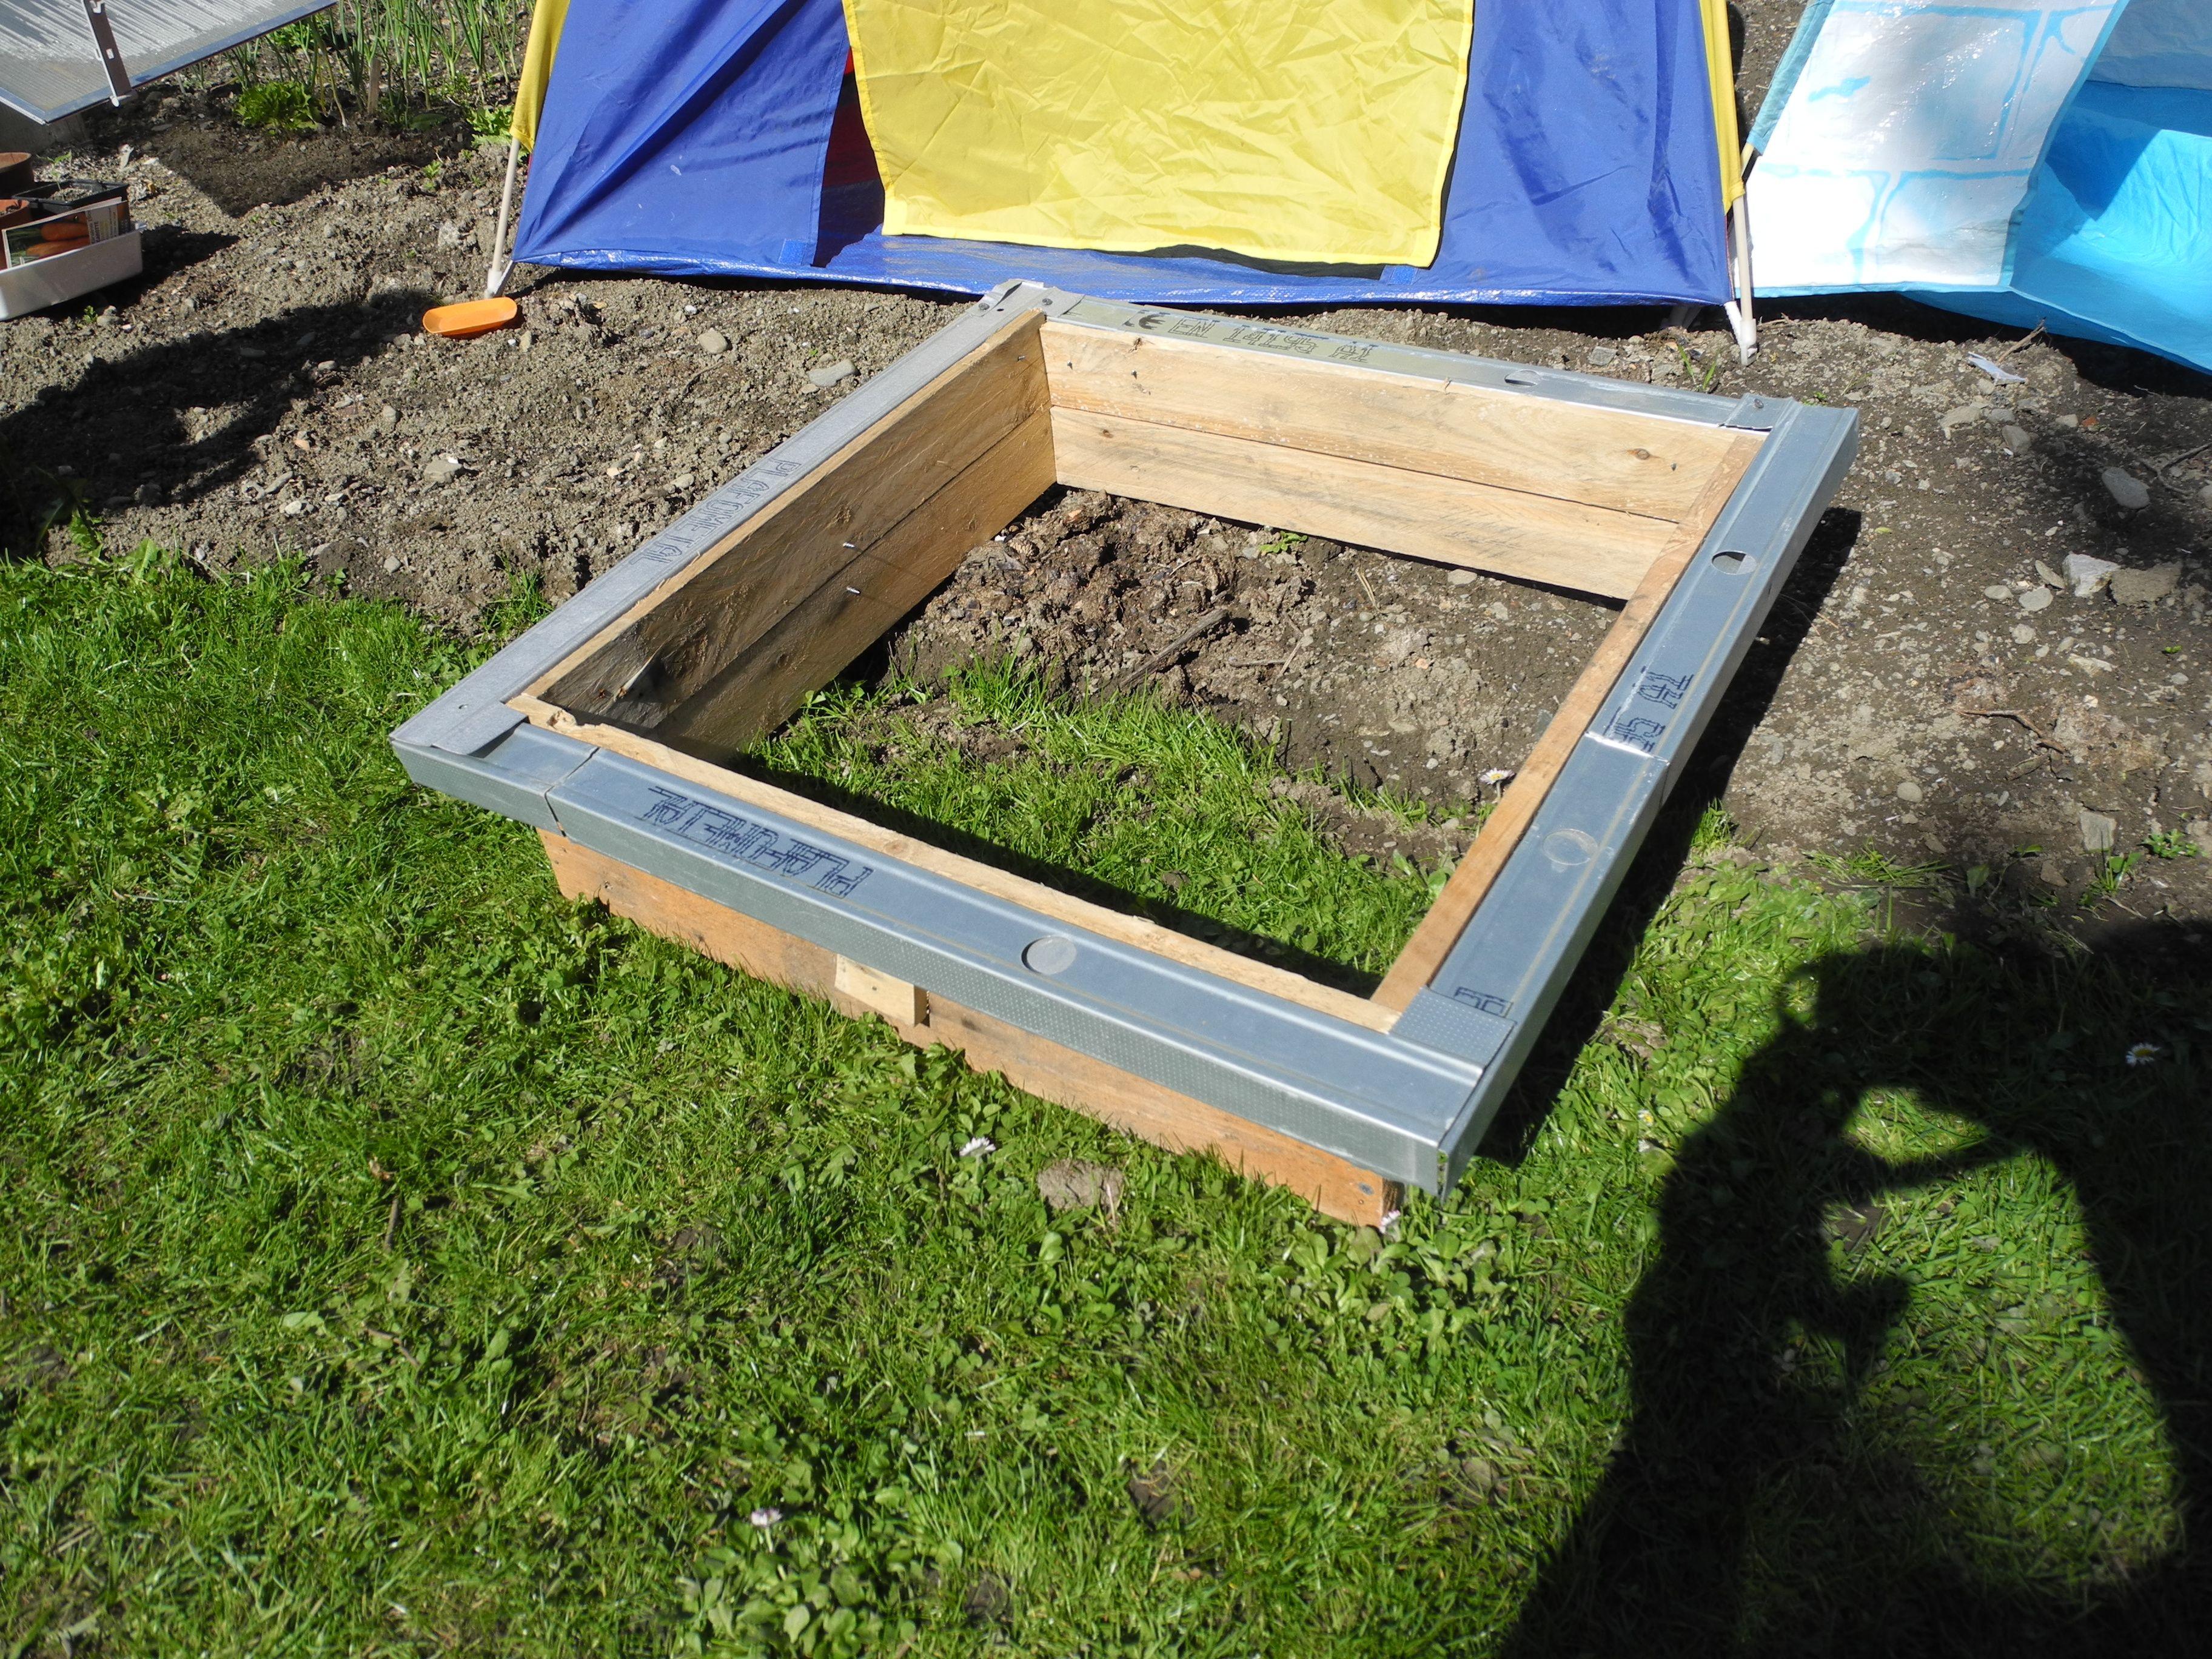 barri re anti limace avec profil alu en u jardin pinterest limace anti limace et en. Black Bedroom Furniture Sets. Home Design Ideas